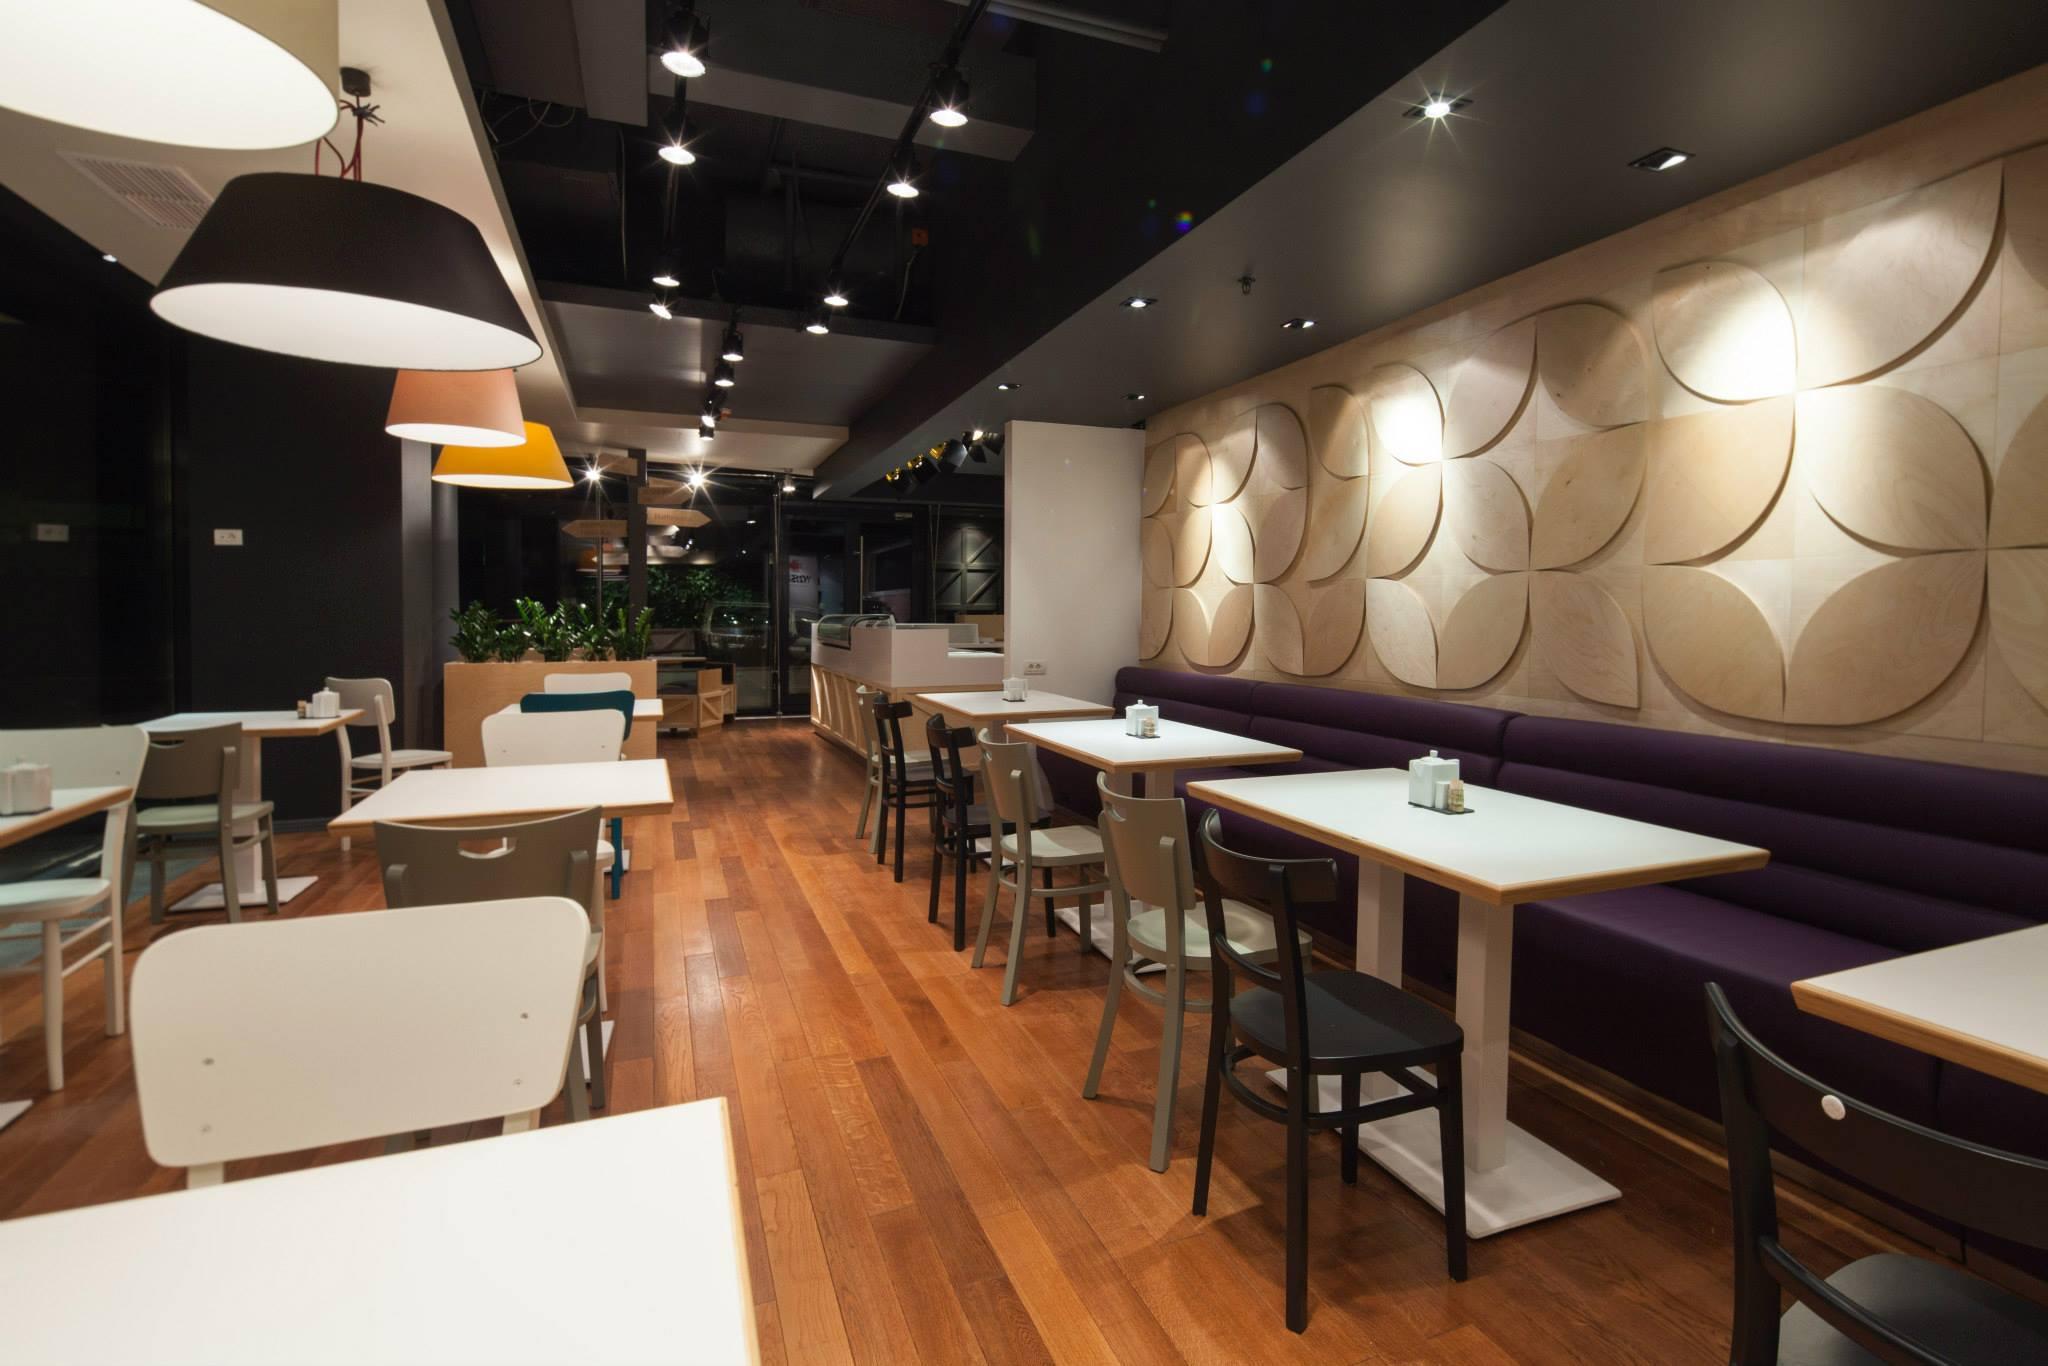 YOSHI-Sushi-Teppanyaki-Trivenus-Ama-Design-10